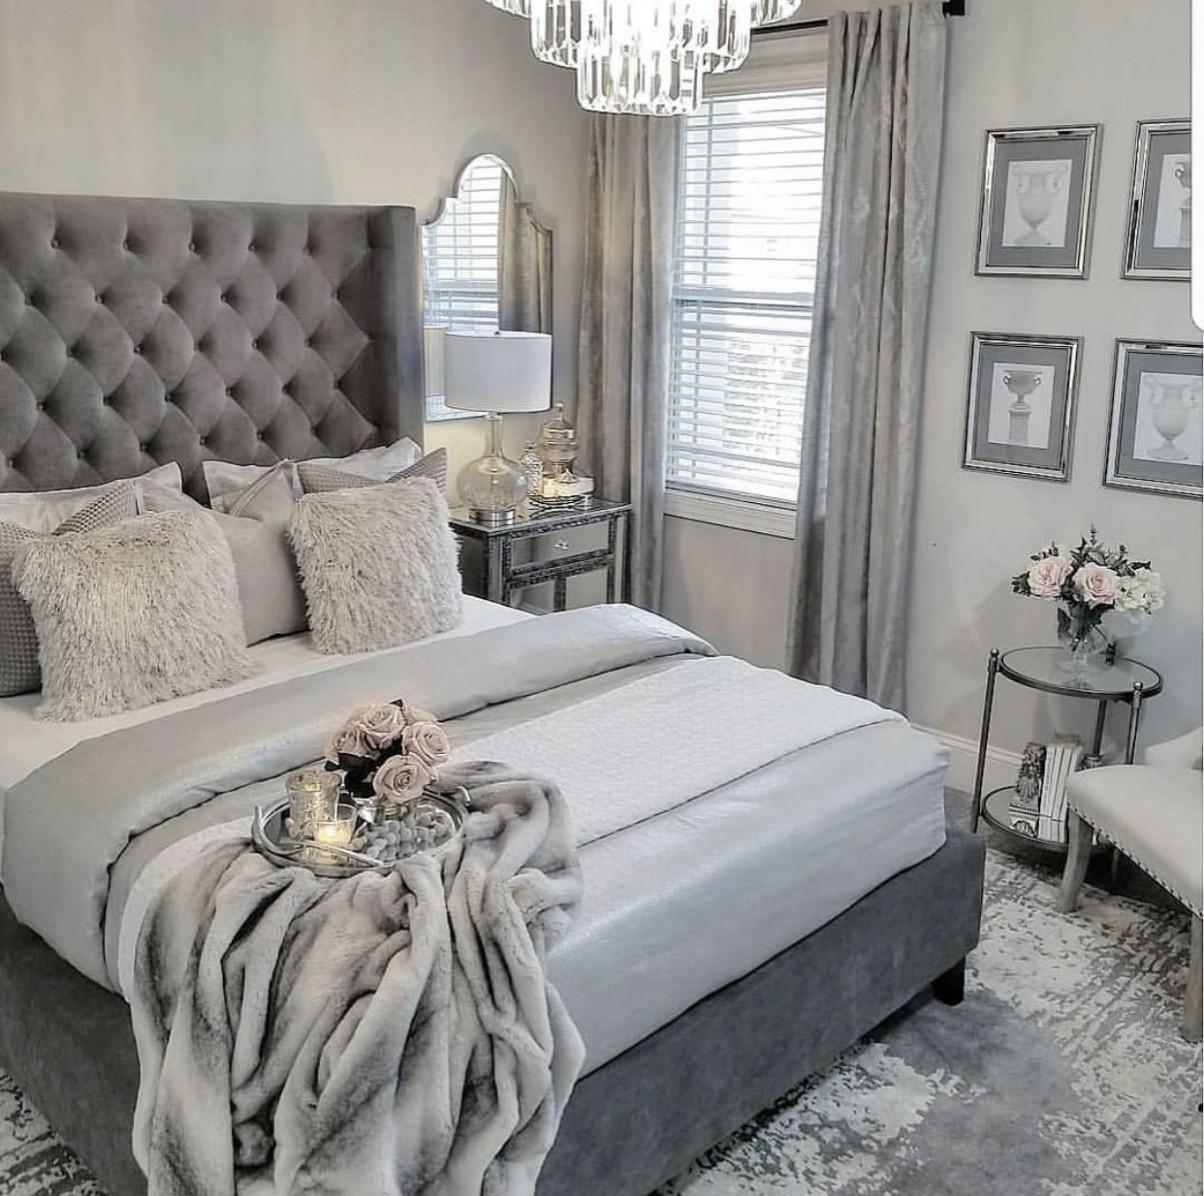 Most Popular grey decorating ideas for hallway for 12  Bedroom  - Bedroom Ideas Grey Bed